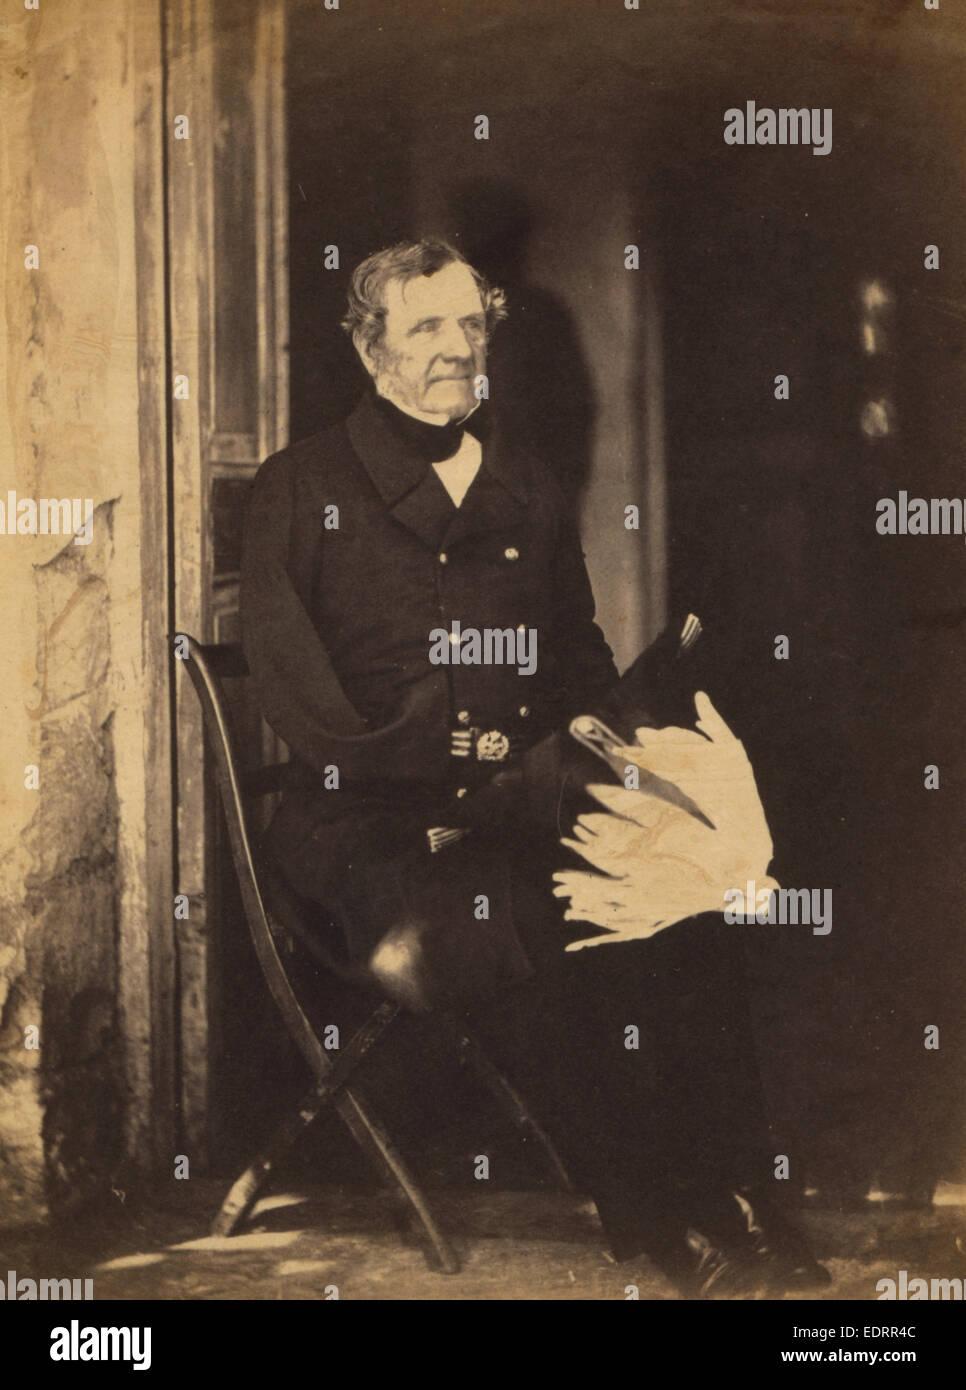 Field Marshall Lord Raglan, Crimean War, 1853-1856, Roger Fenton historic war campaign photo - Stock Image